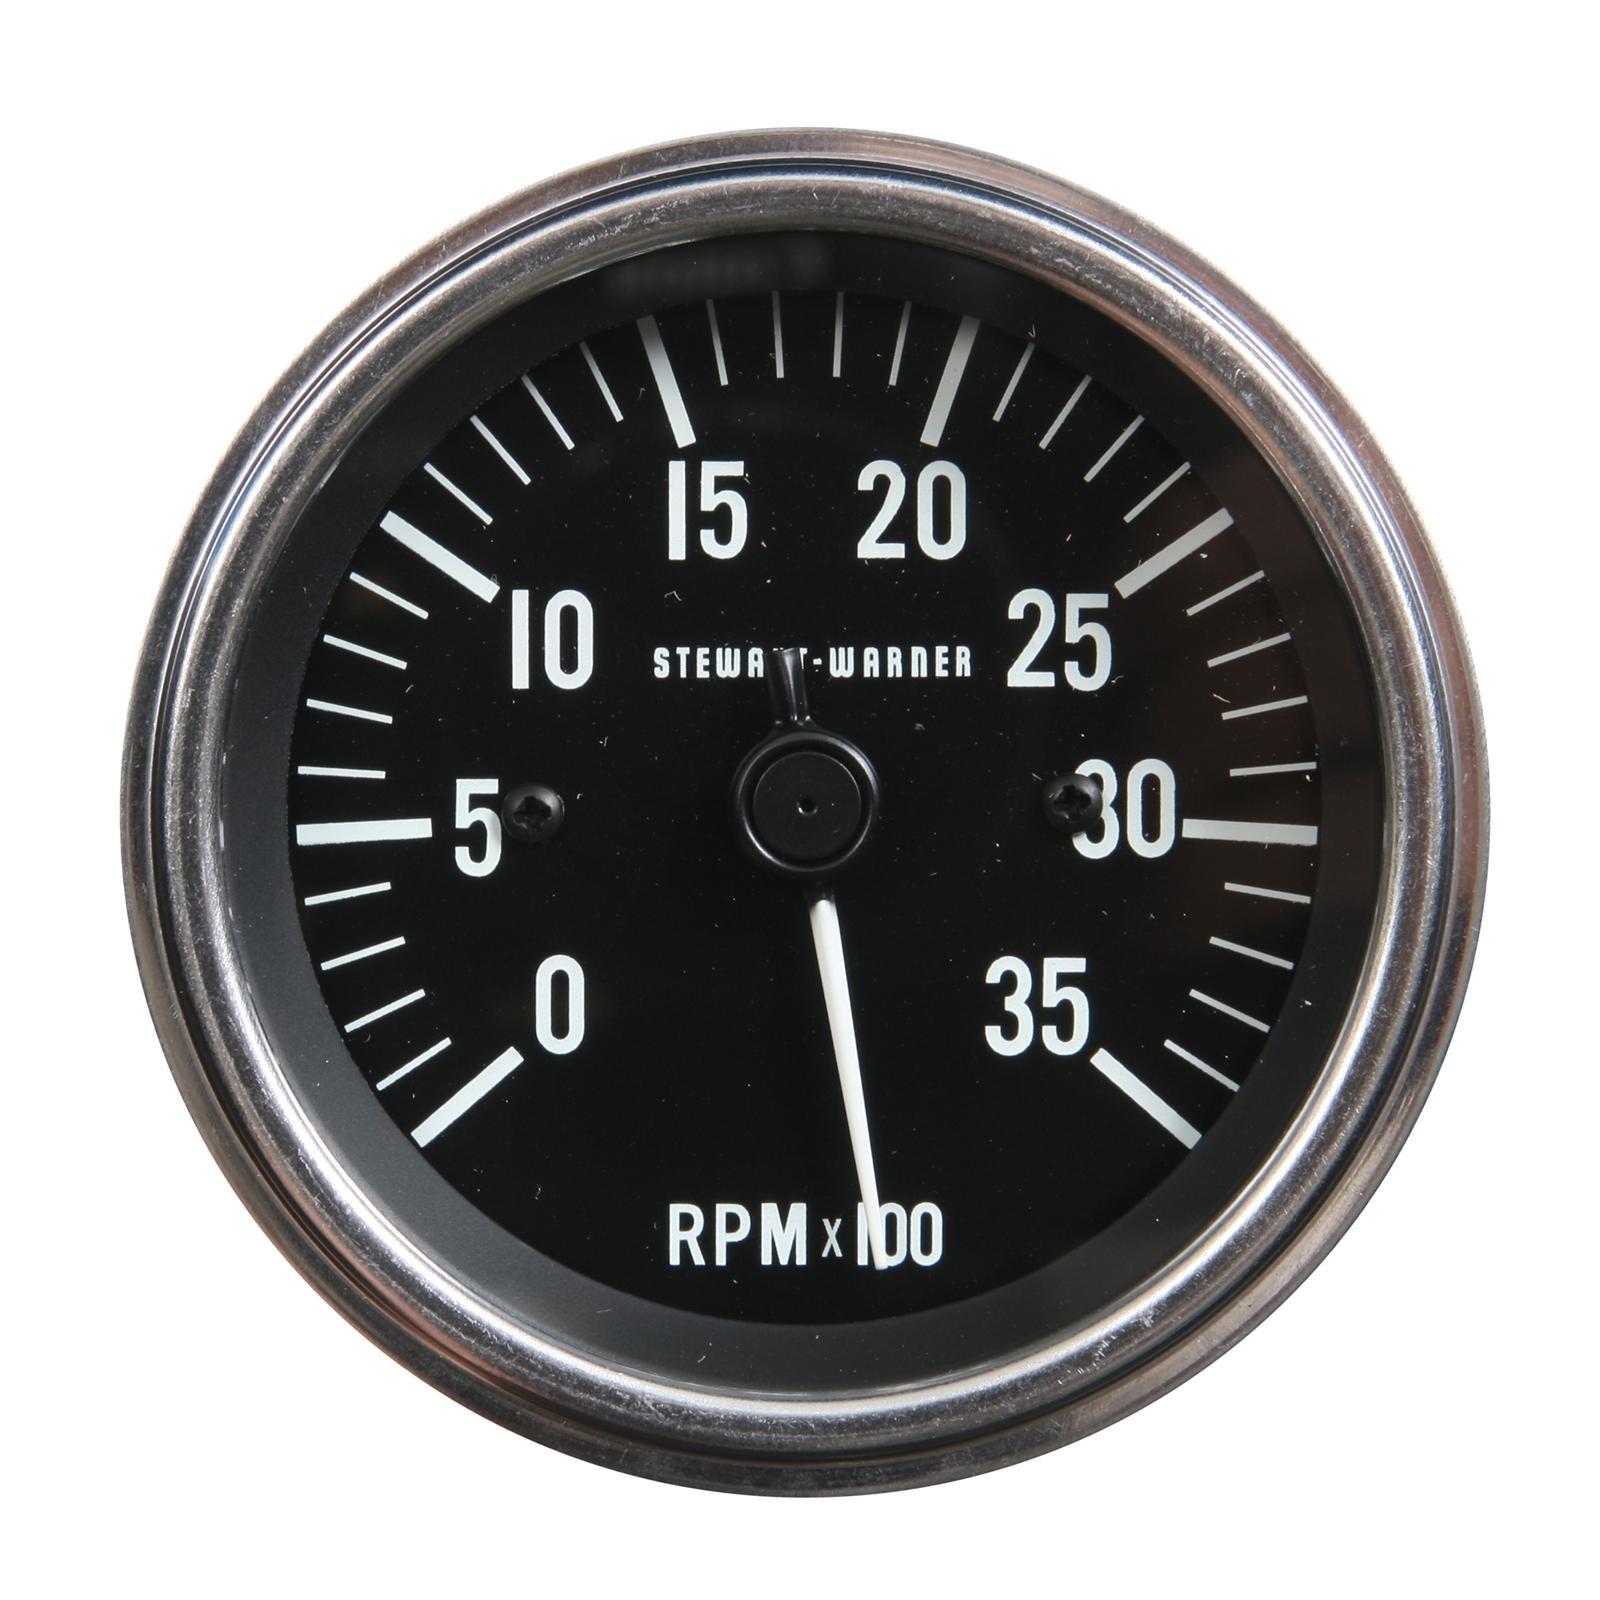 stewart warner gauges wiring diagrams 2007 ford focus car stereo diagram tachometer bing images